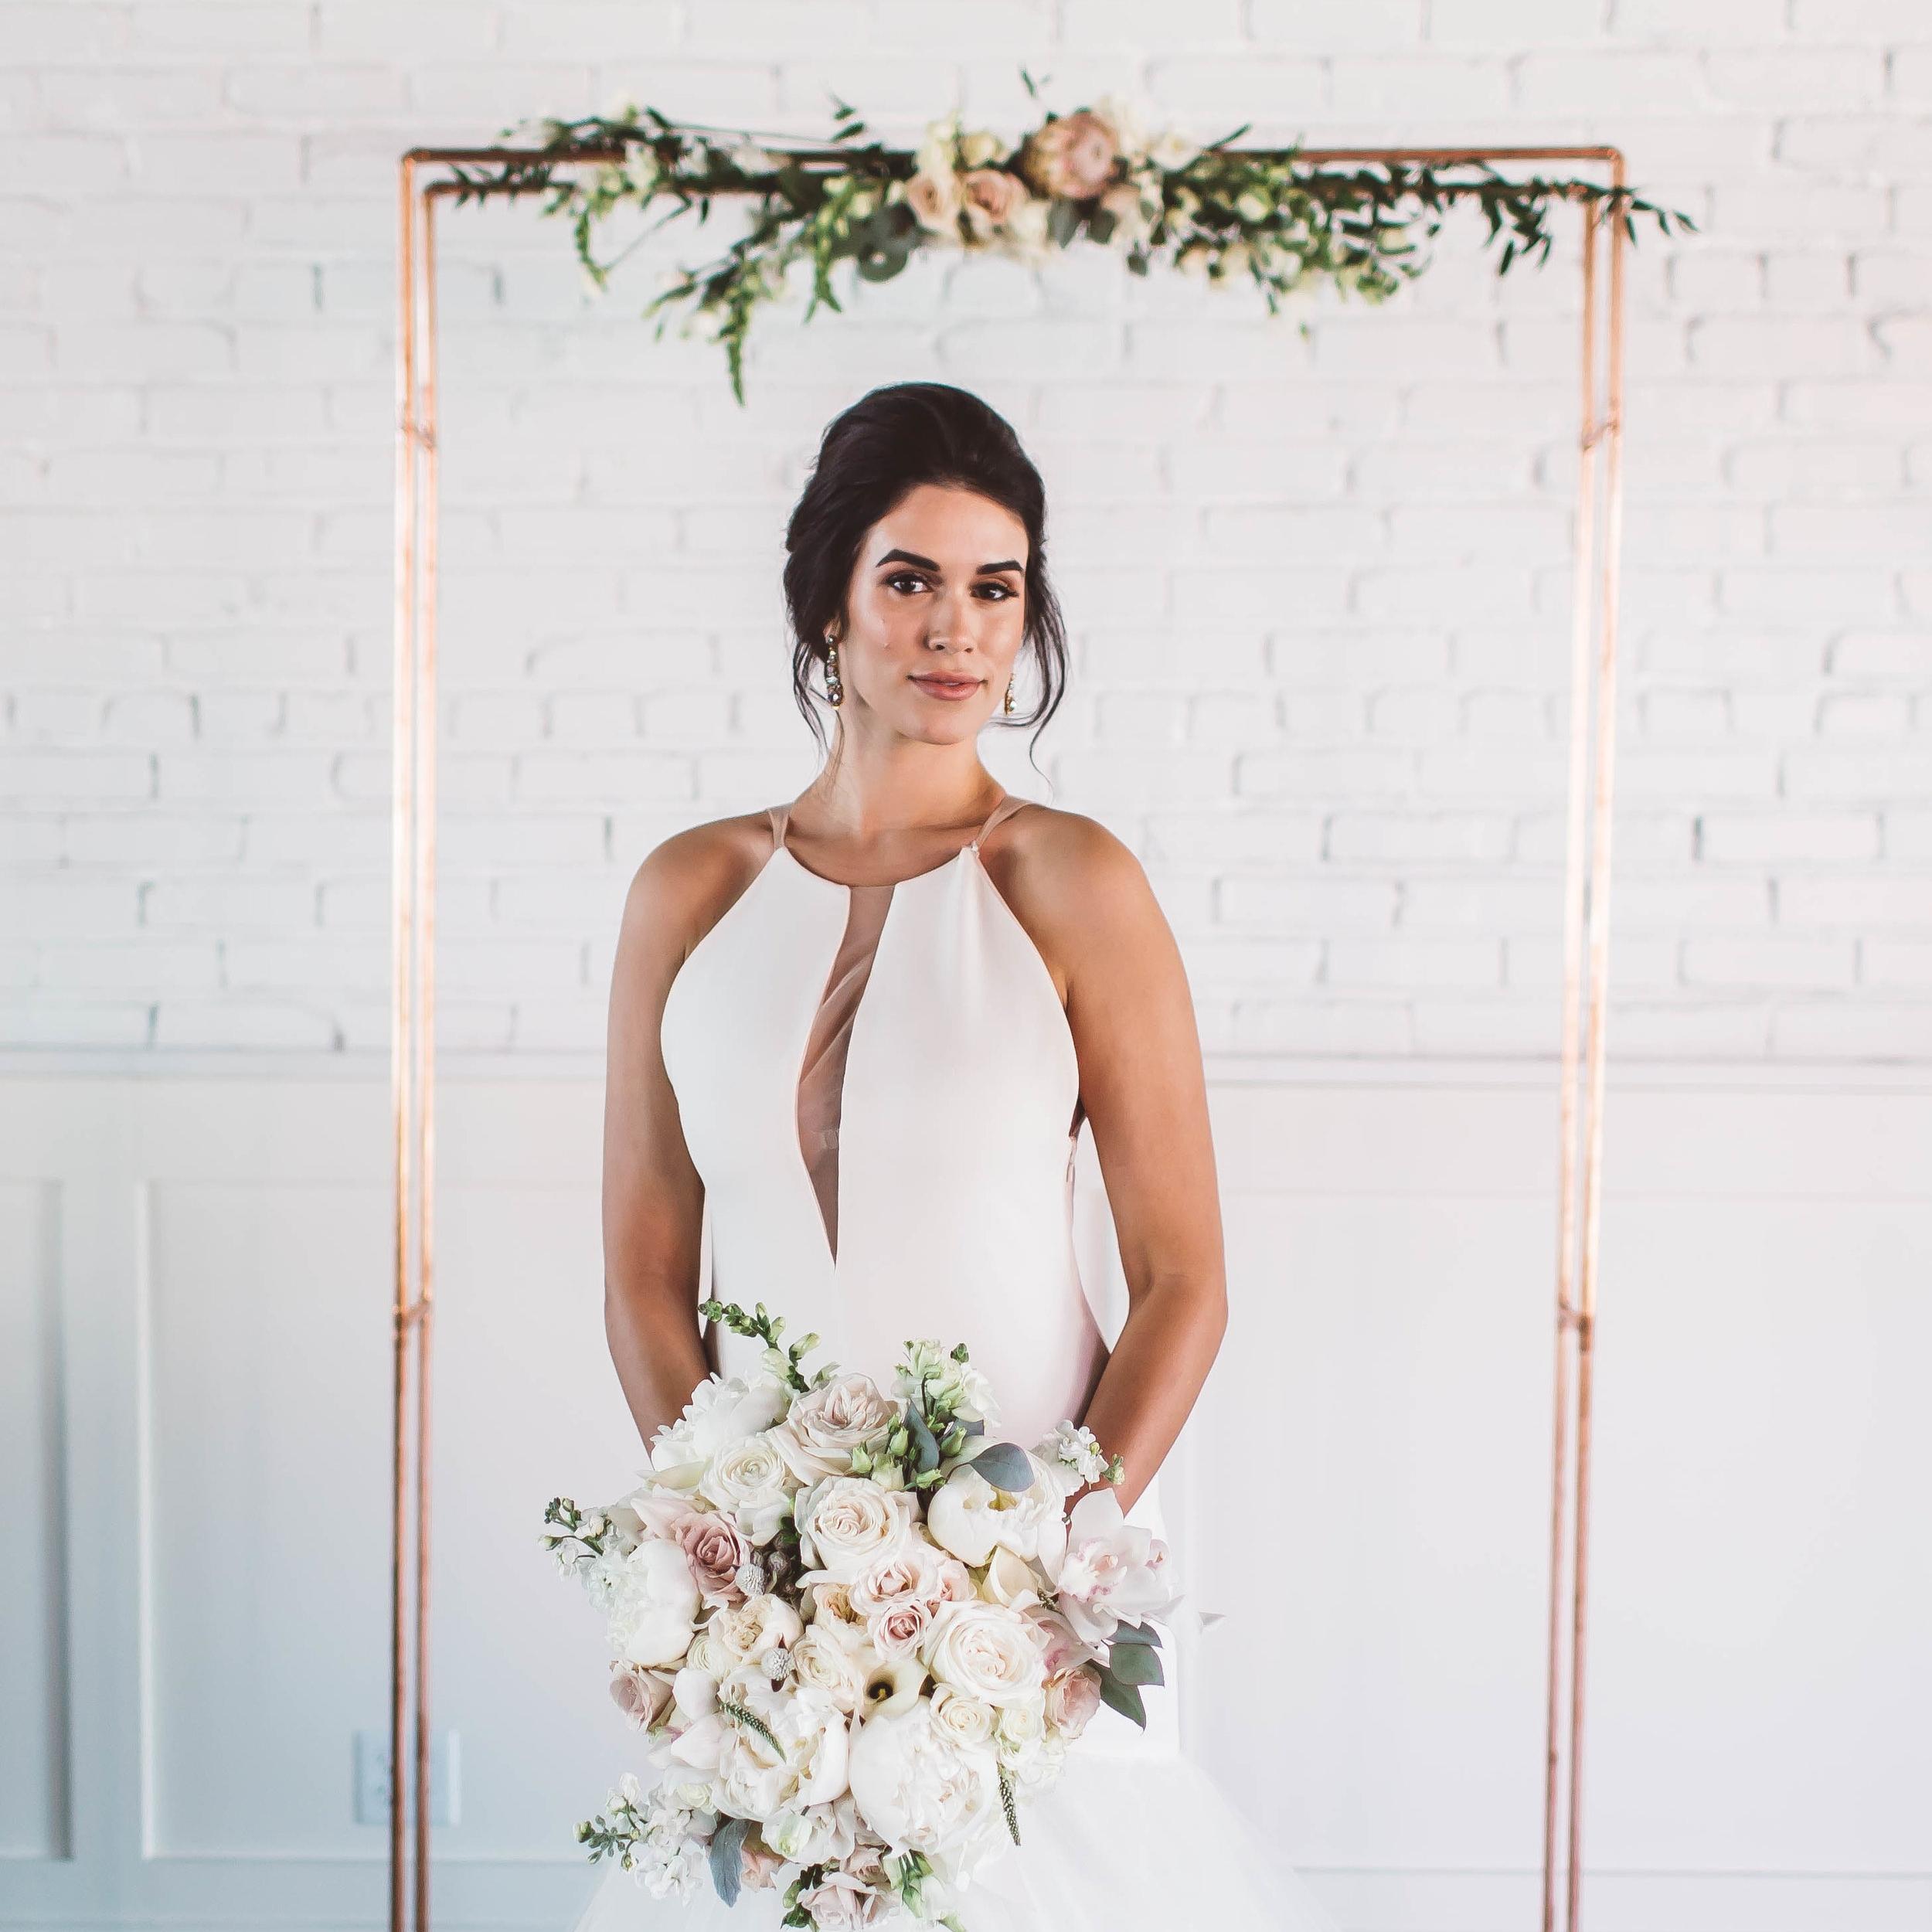 Martha Stewart Weddings   Rose Gold Wedding Ideas That Make a Statement